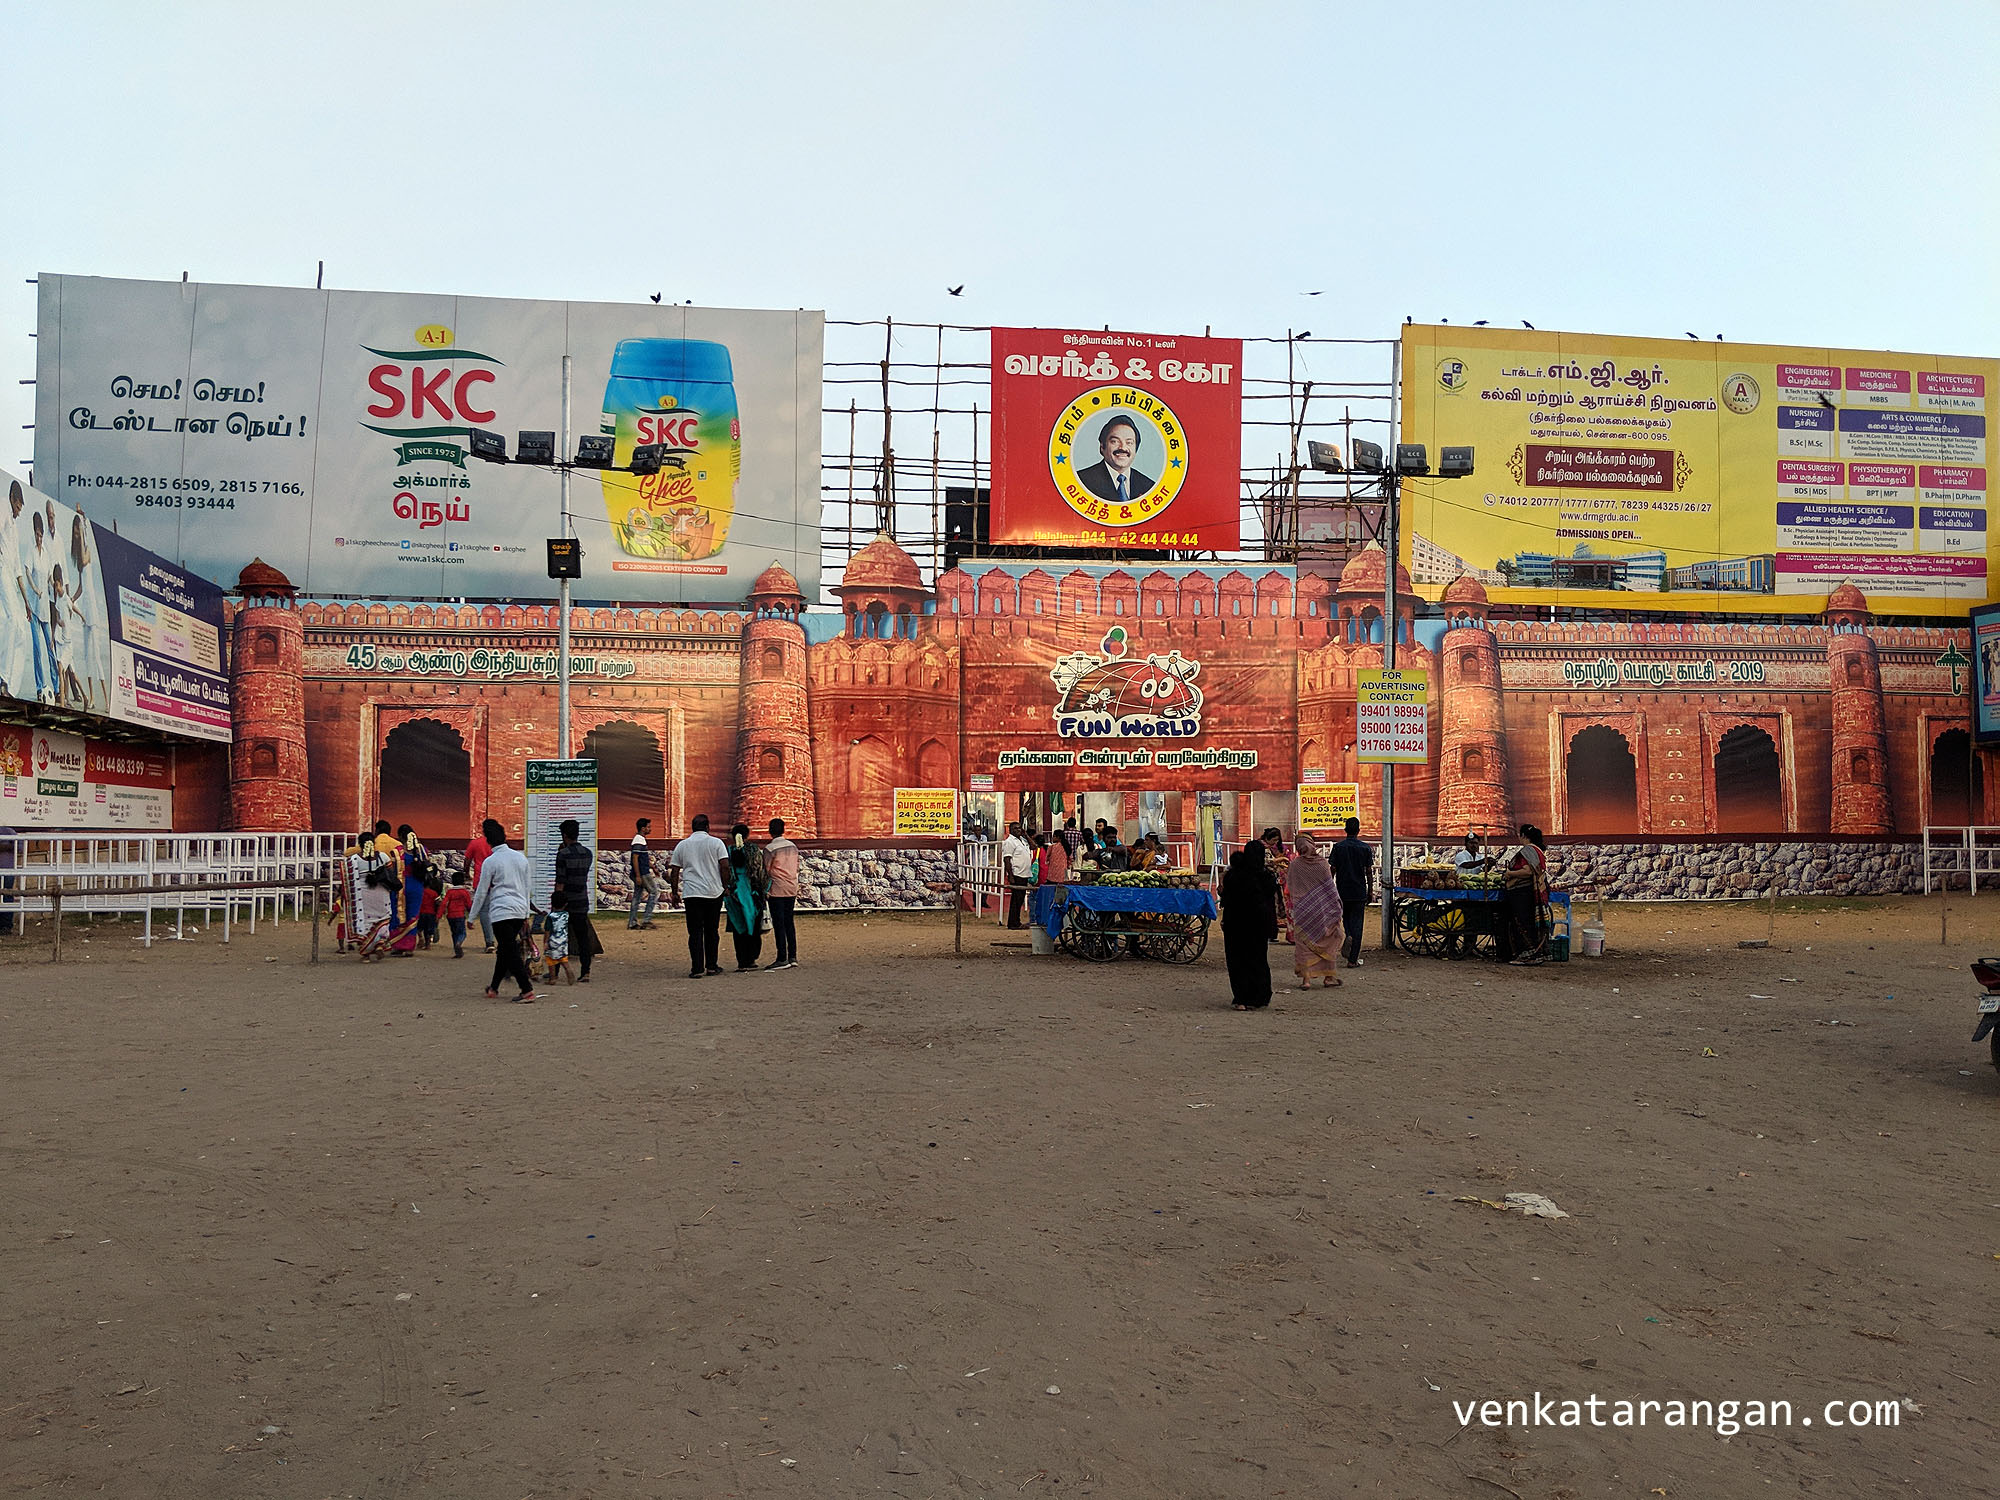 Chennai Trade Fair 2019 - 45ஆம் ஆண்டு இந்திய சுற்றுலா தொழிற் பொருட்காட்சி 2019